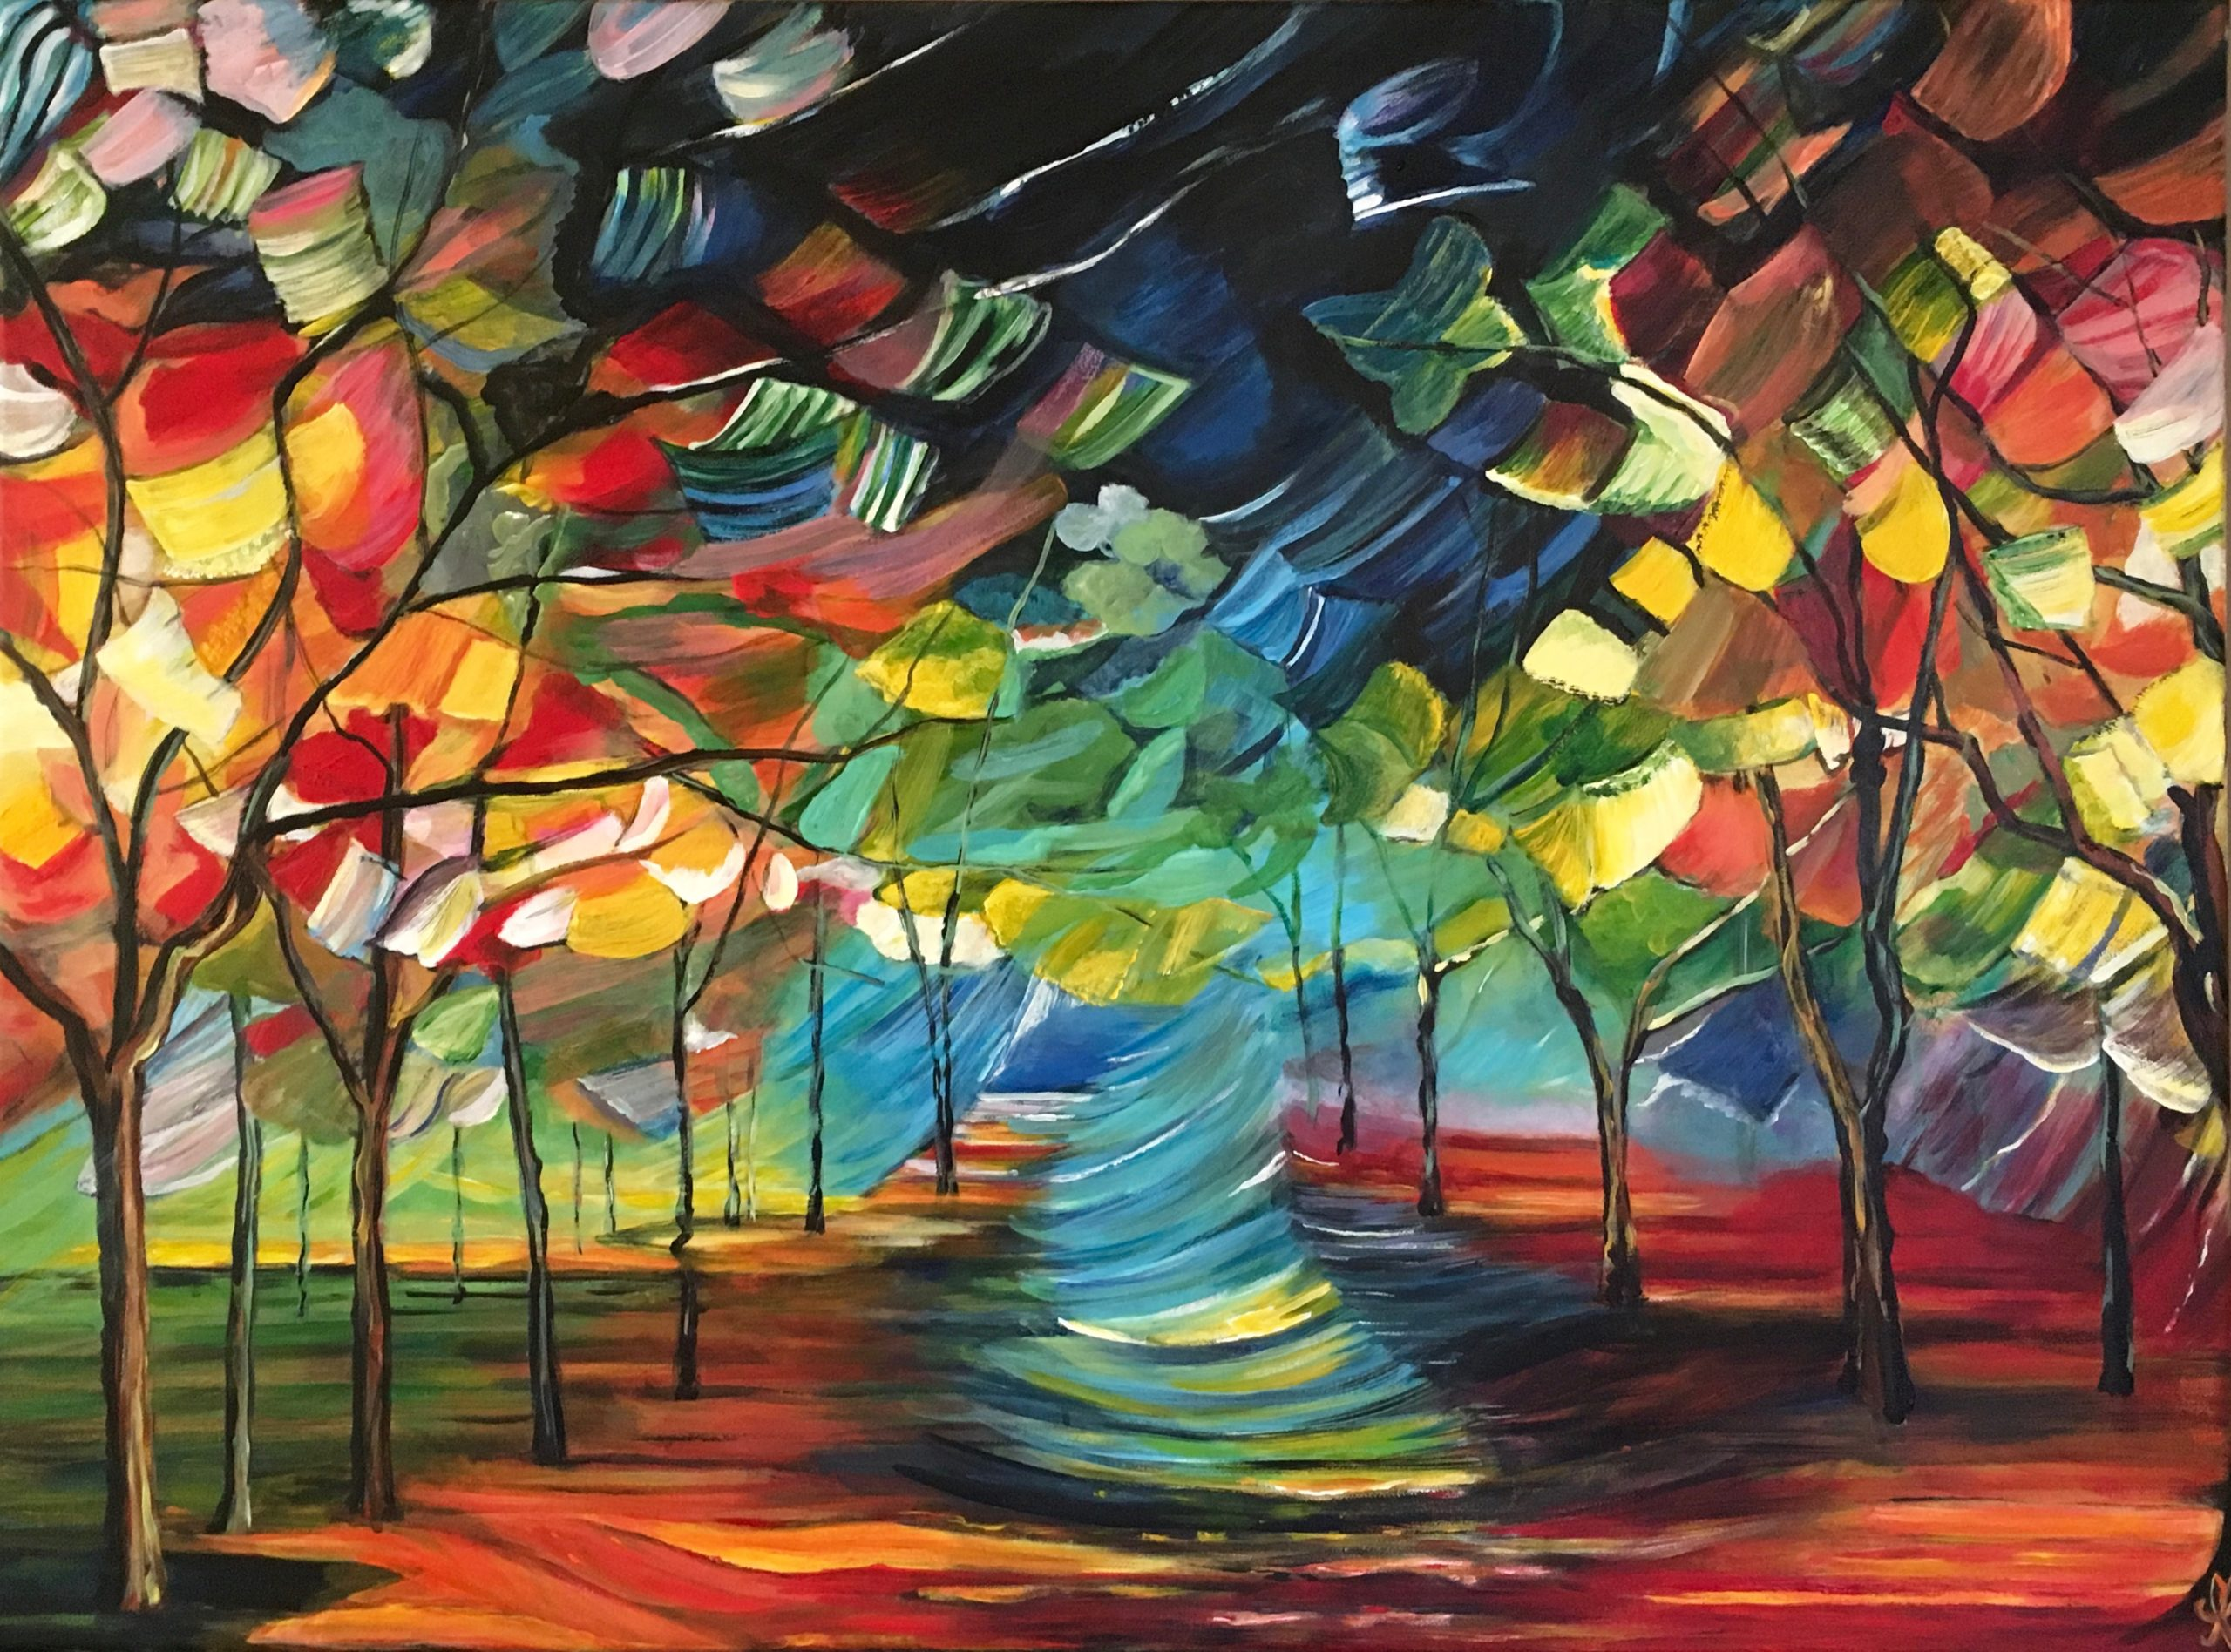 Autumn breath in money wood - acrylic on canvas 80X60